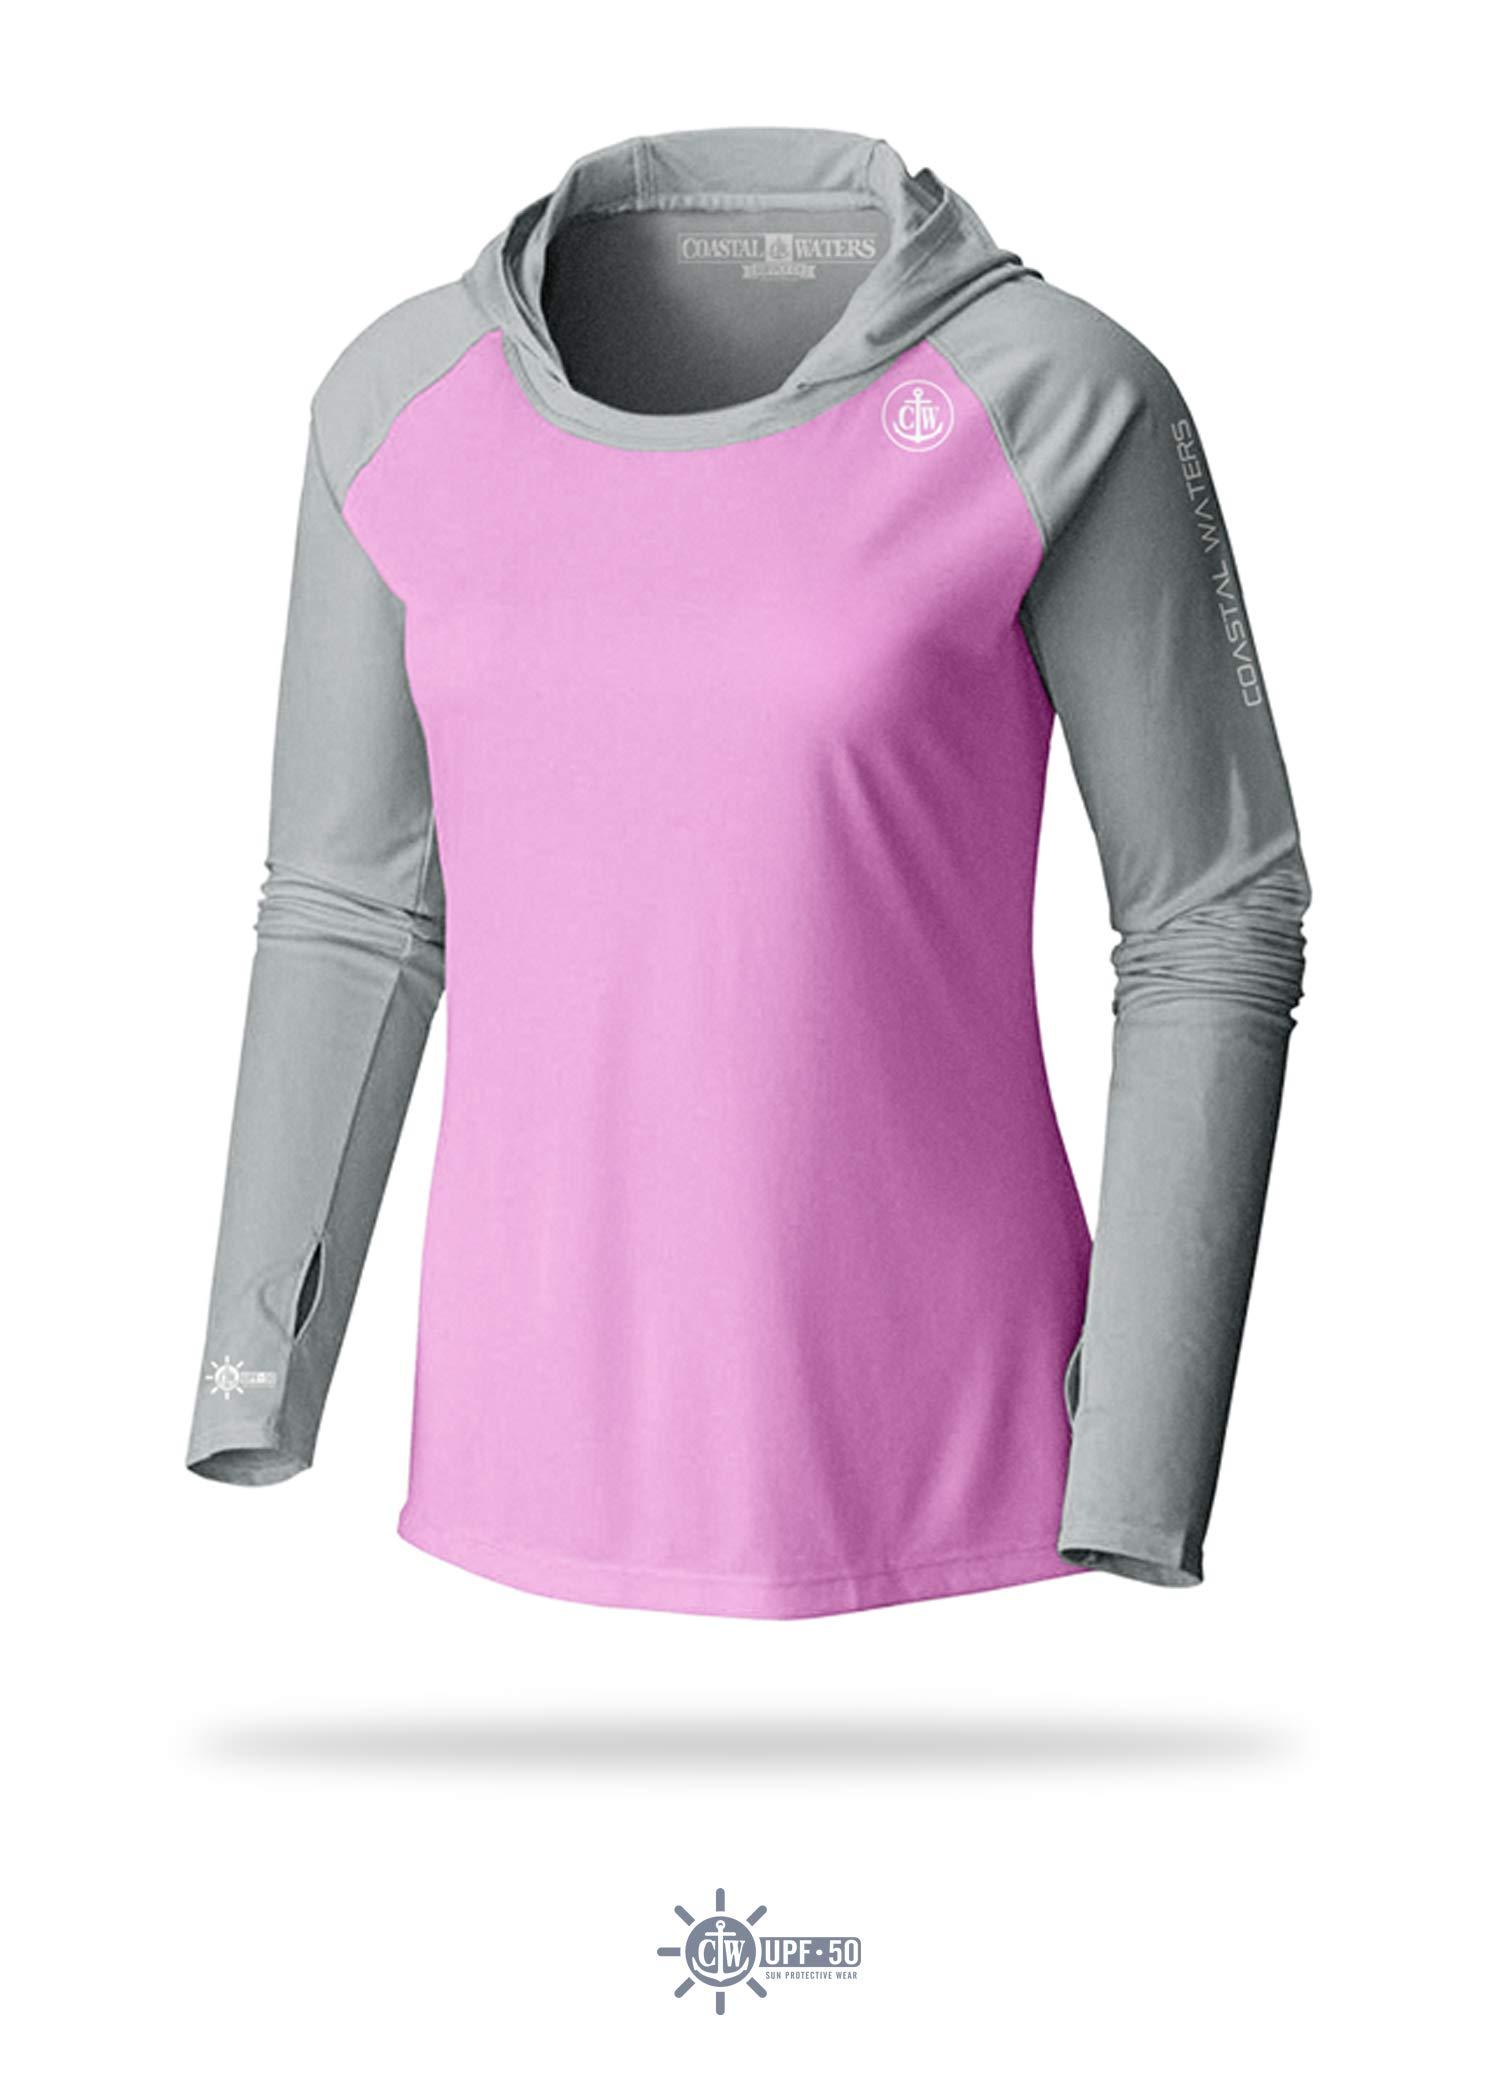 Women's Hooded Raglan Sun Protection (Pink/Grey, Small)